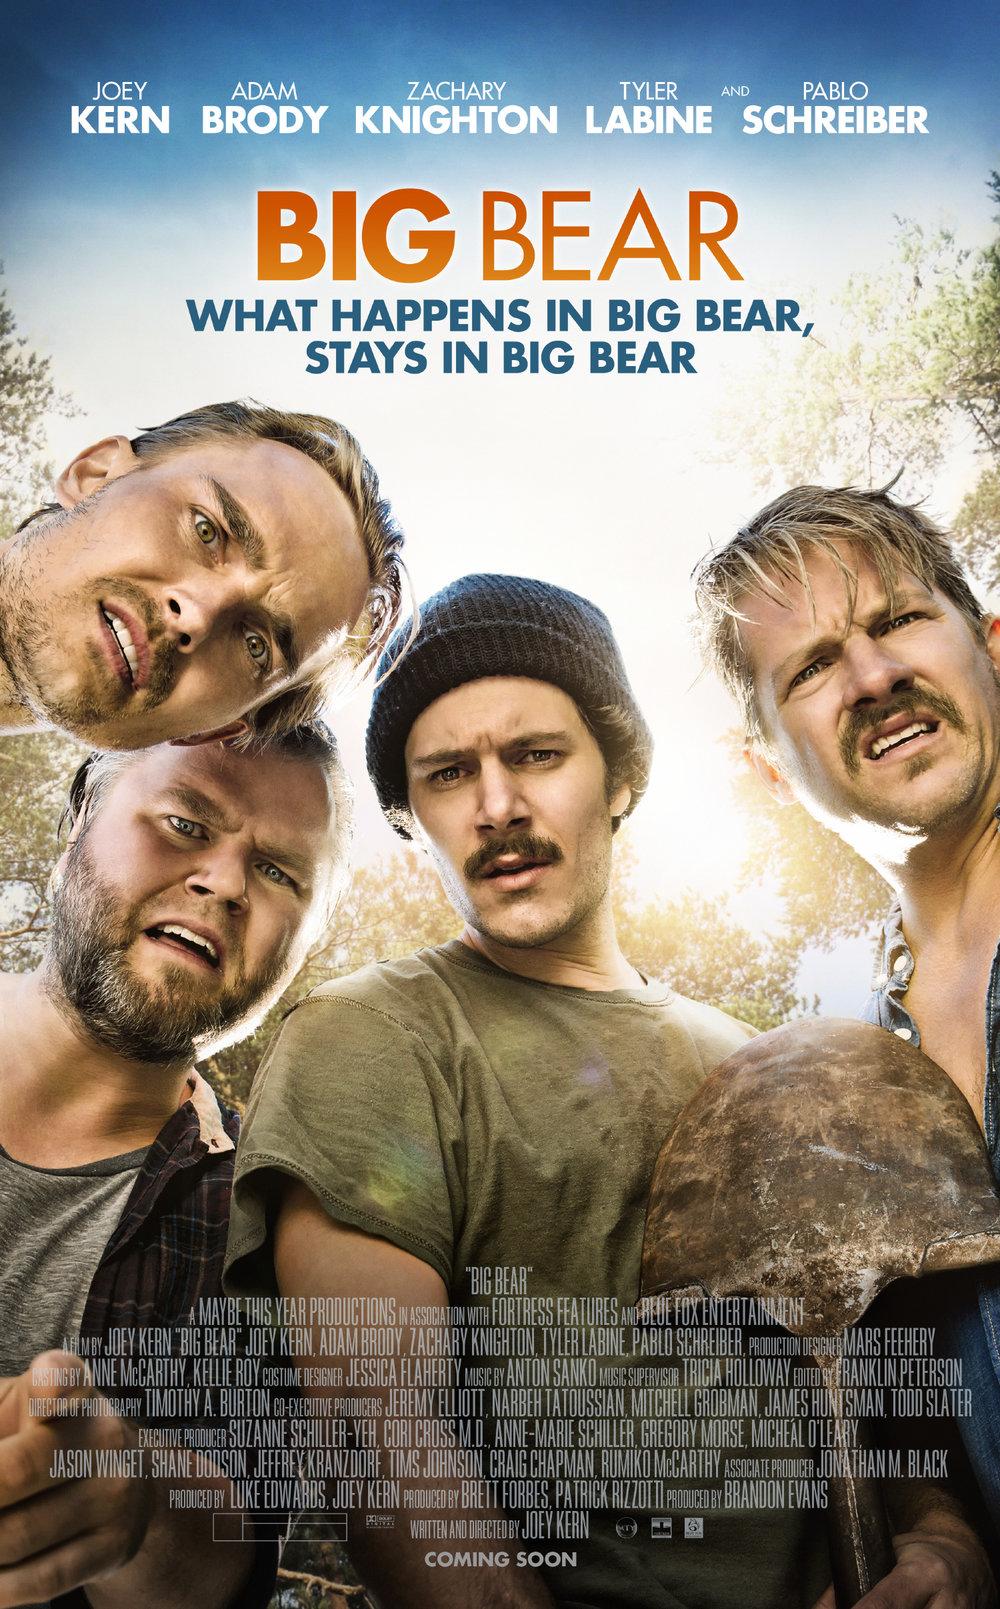 Joey Kern, Zachery Knighton, Adam Brody & Tyler Labine.